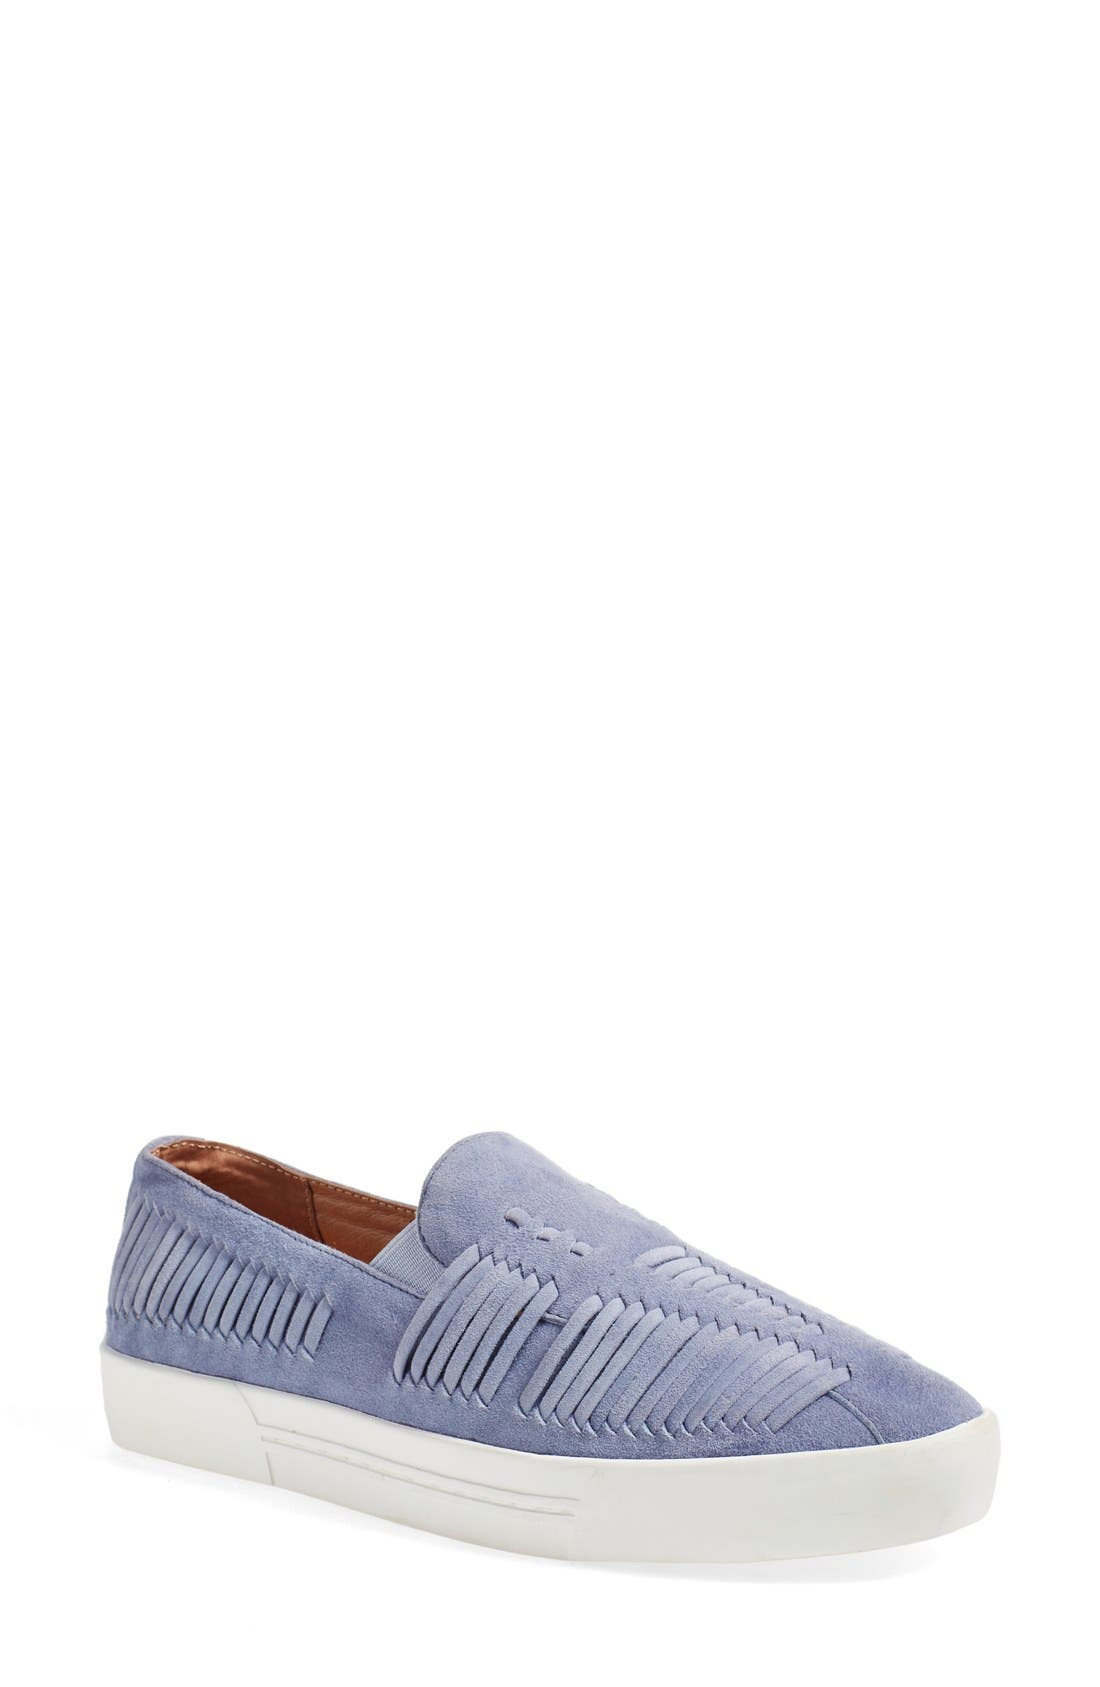 Main Image - Joie 'Huxley' Slip-On Sneaker (Women)